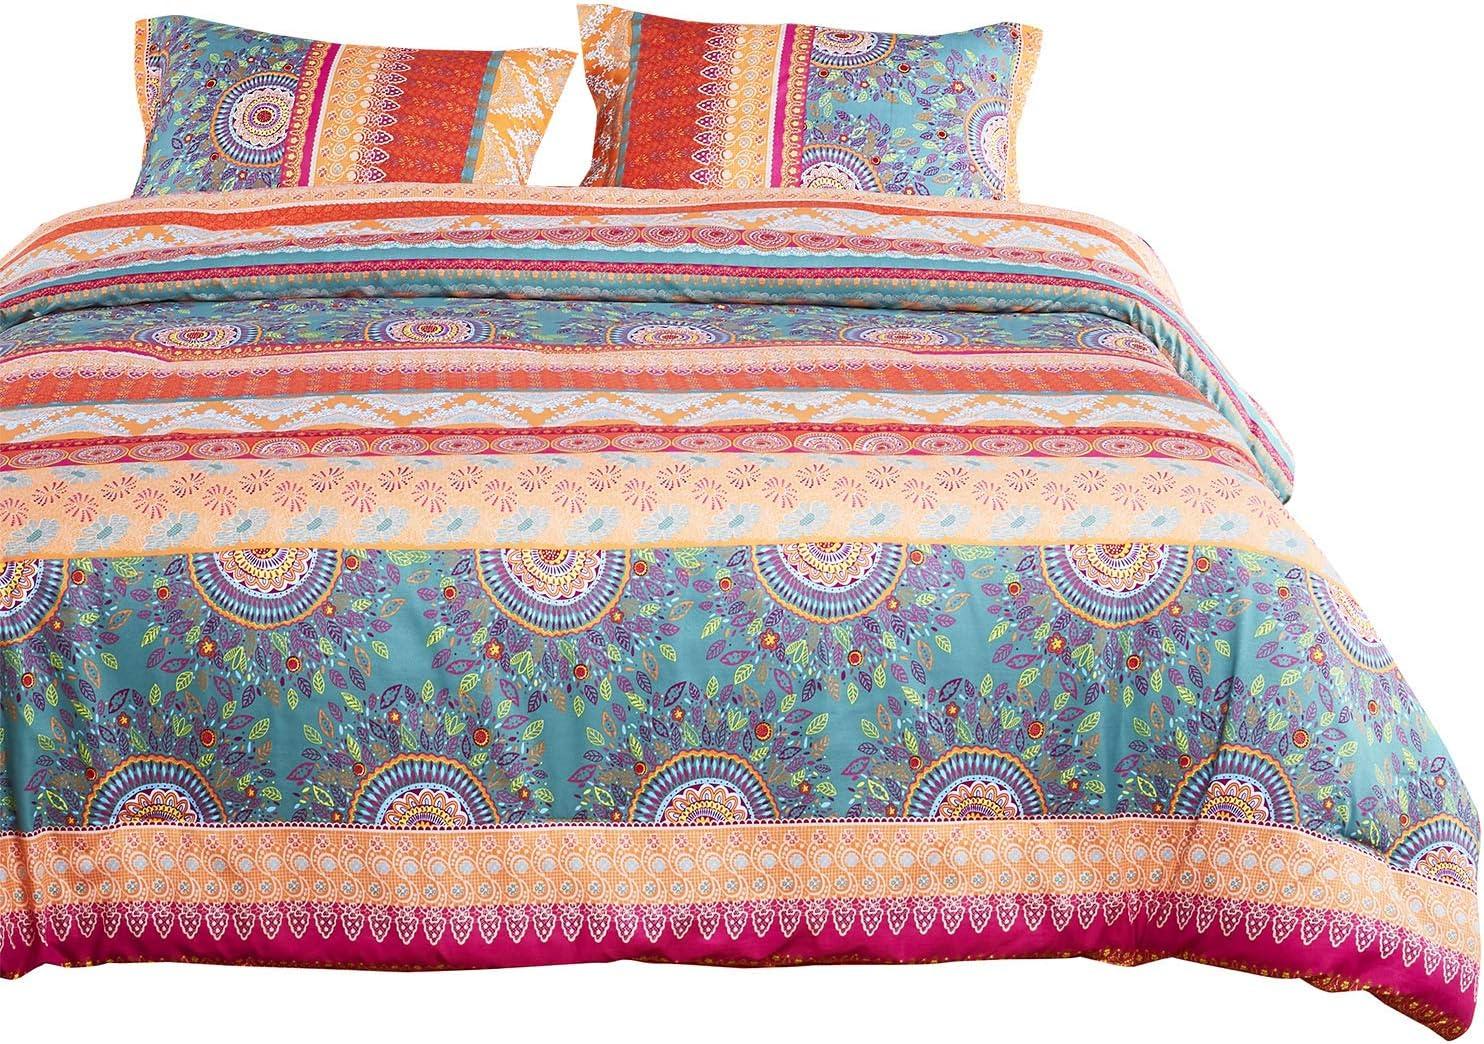 Wake In Cloud - Bohemian Duvet Cover Set, Orange Coral Boho Chic Mandala Printed Soft Microfiber Bedding, with Zipper Closure (3pcs, King Size)